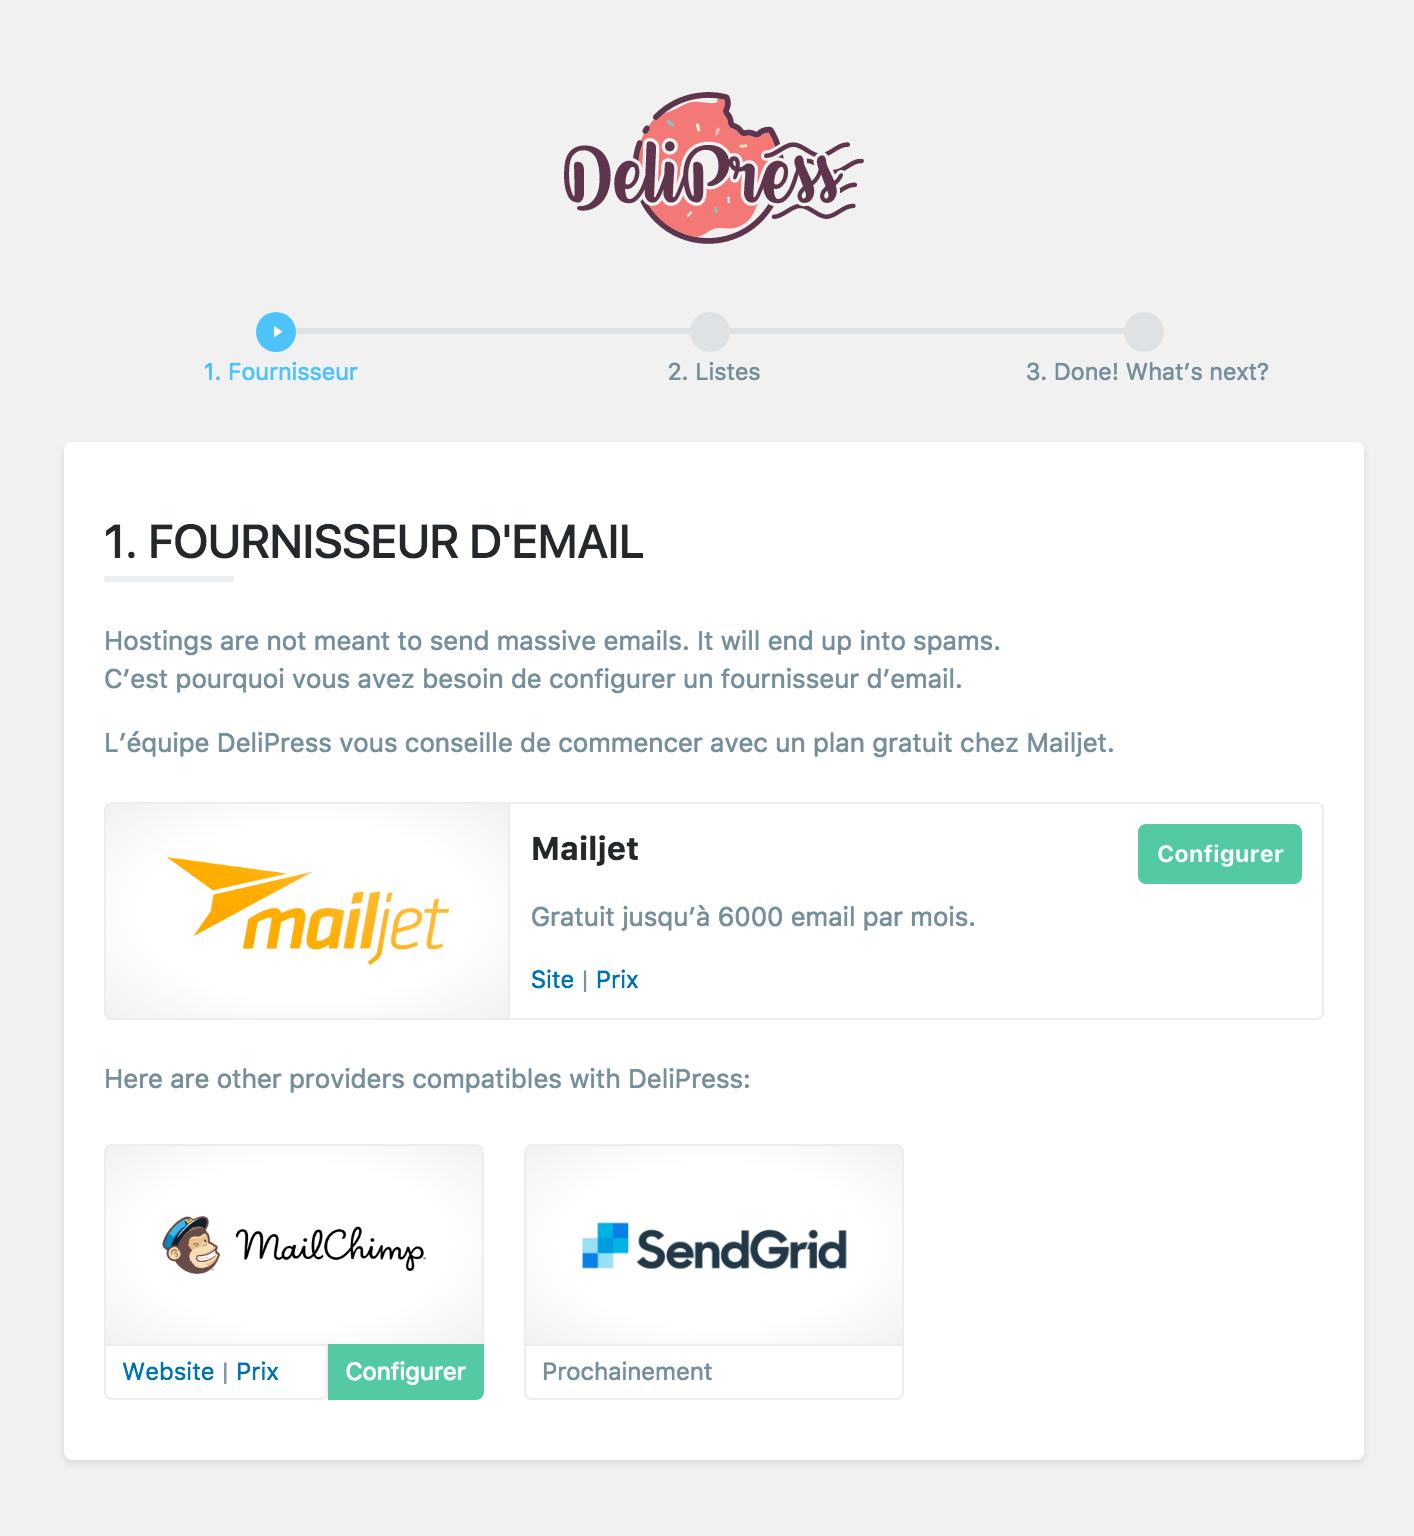 delipress fournisseurs email